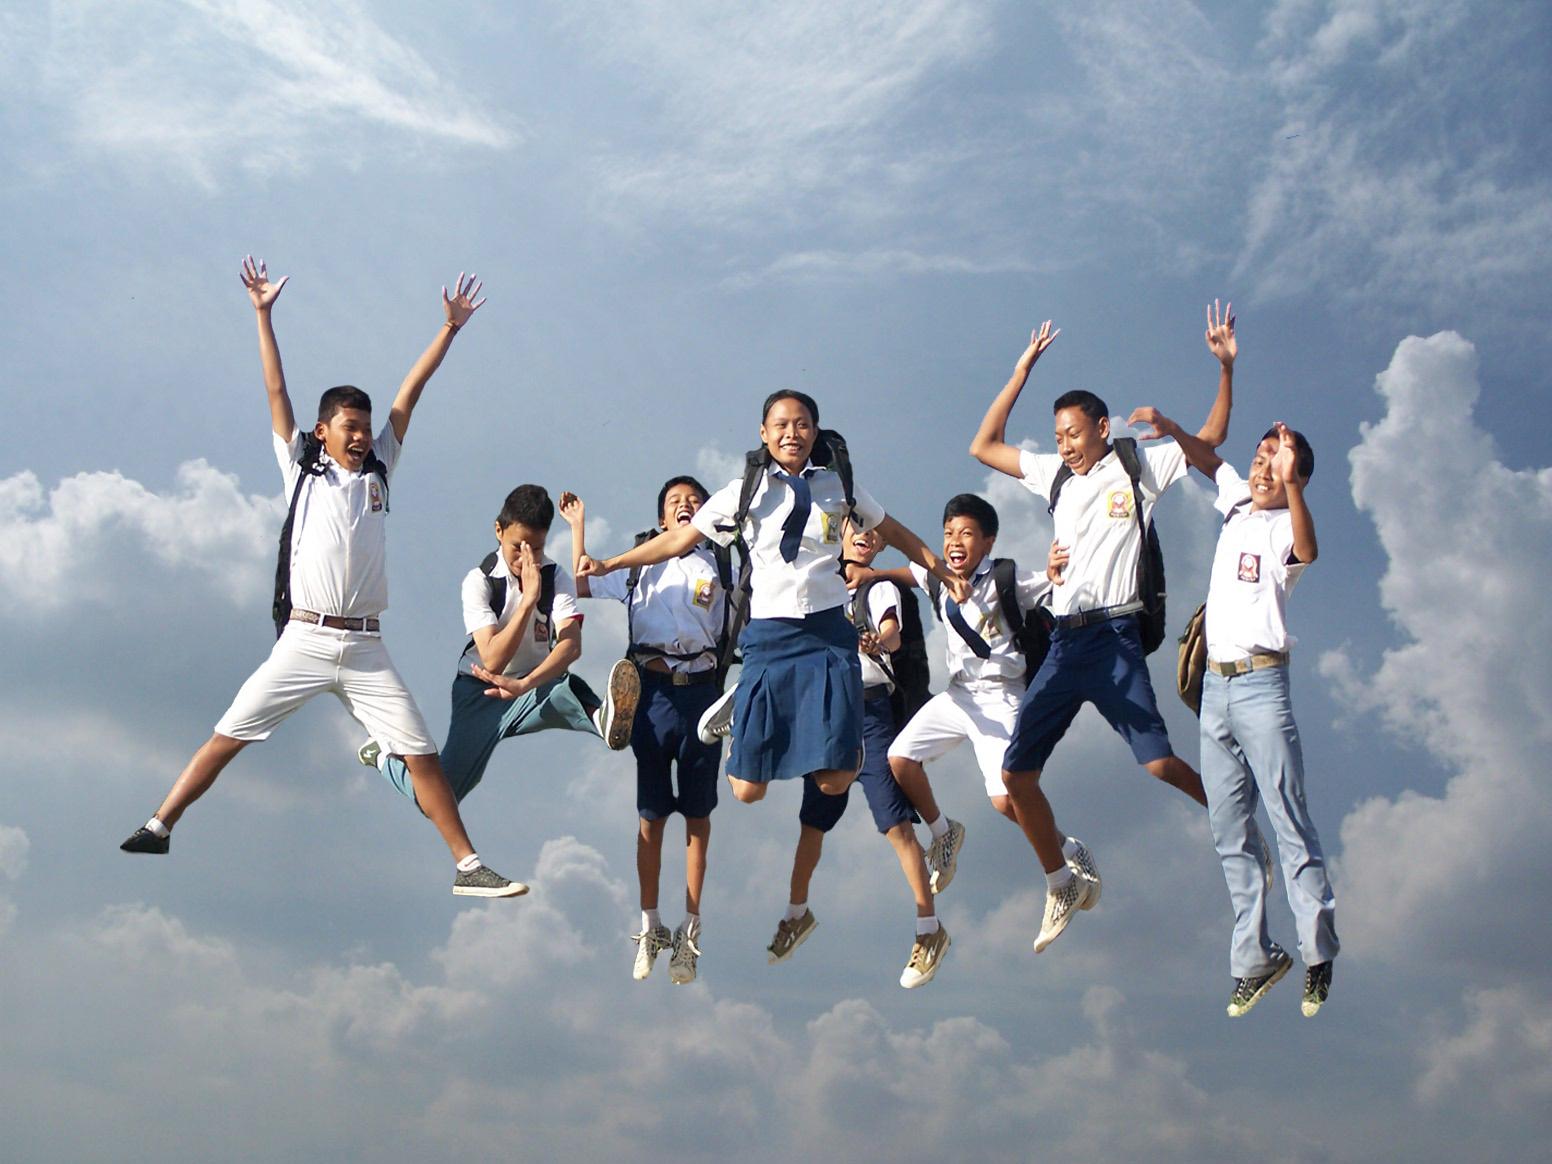 15 Pengertian Pendidikan Menurut Para Ahli